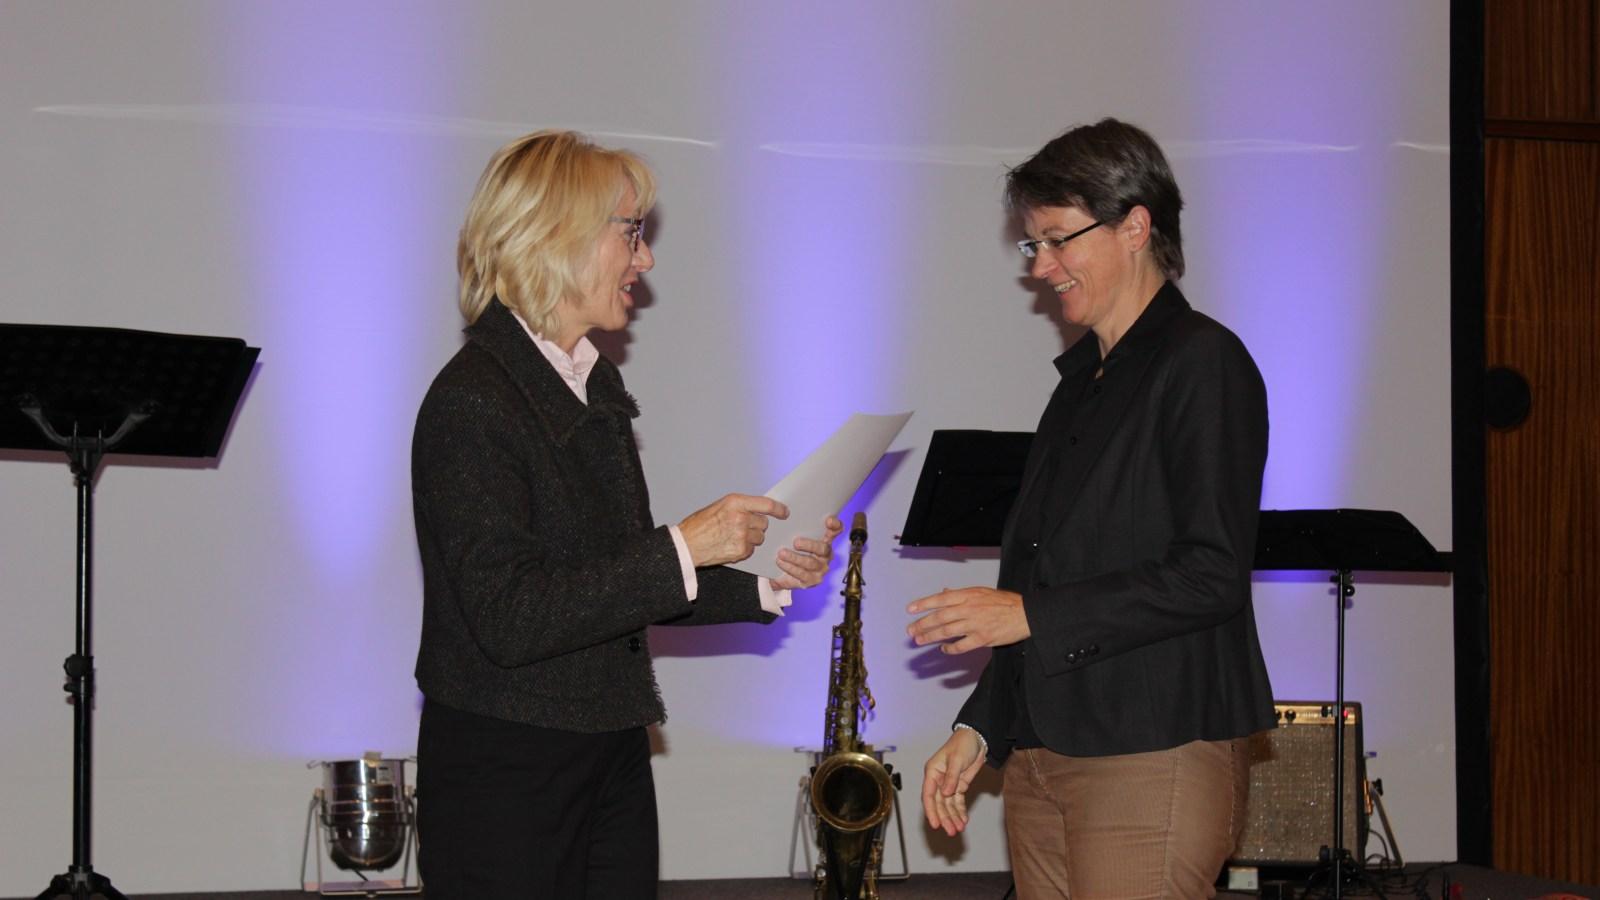 Personaltrainerin Petra Meier coacht Kalk für alle